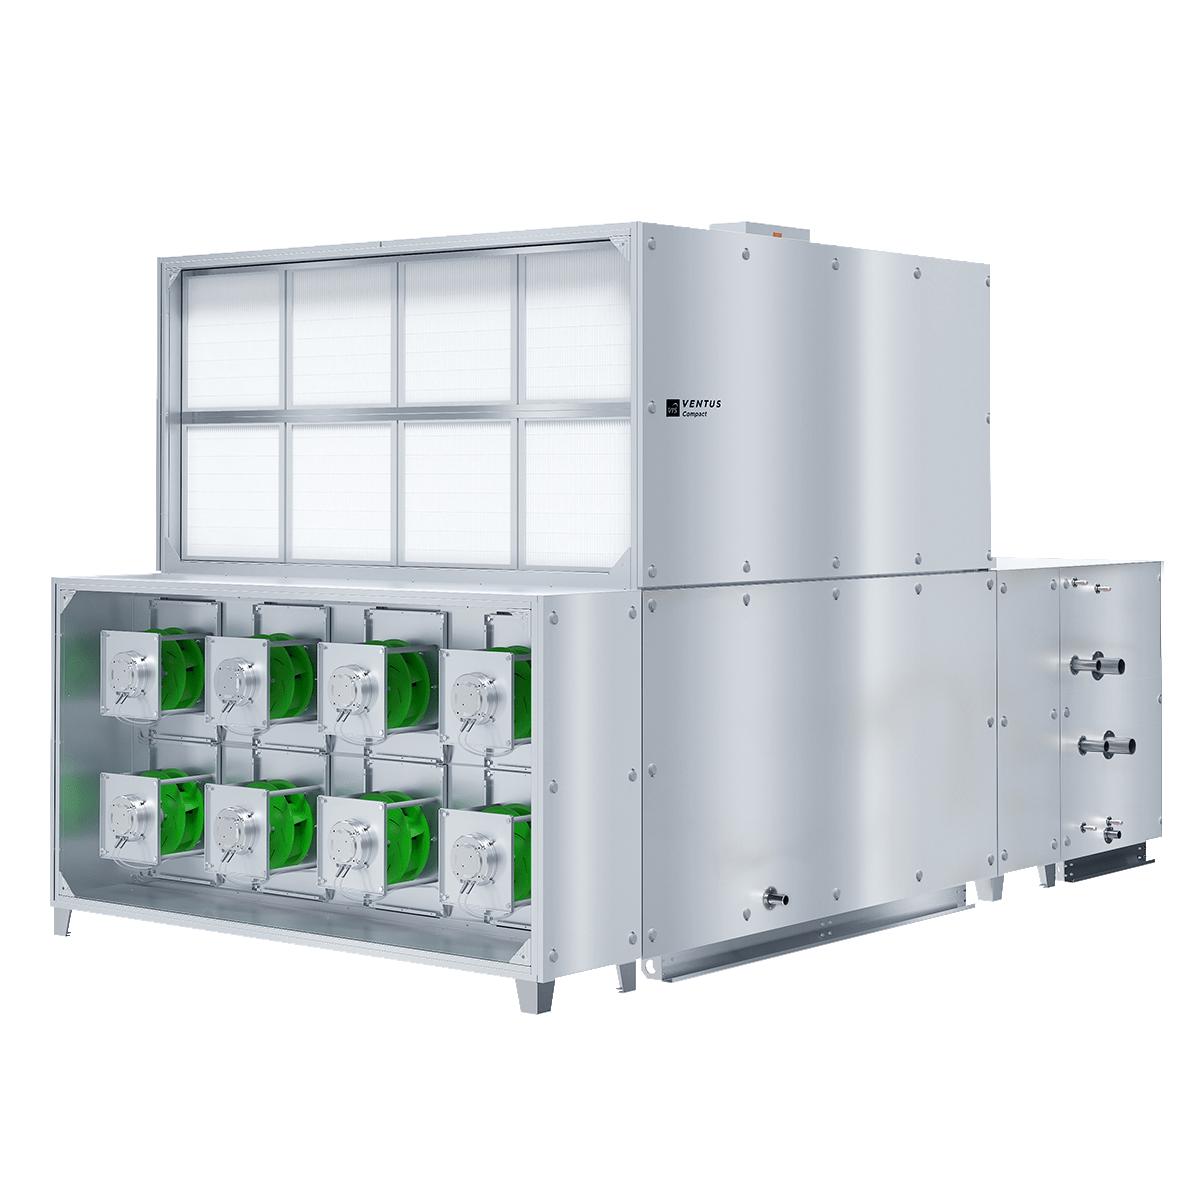 Ventus luchtbehandelingskast compact vvs 150c